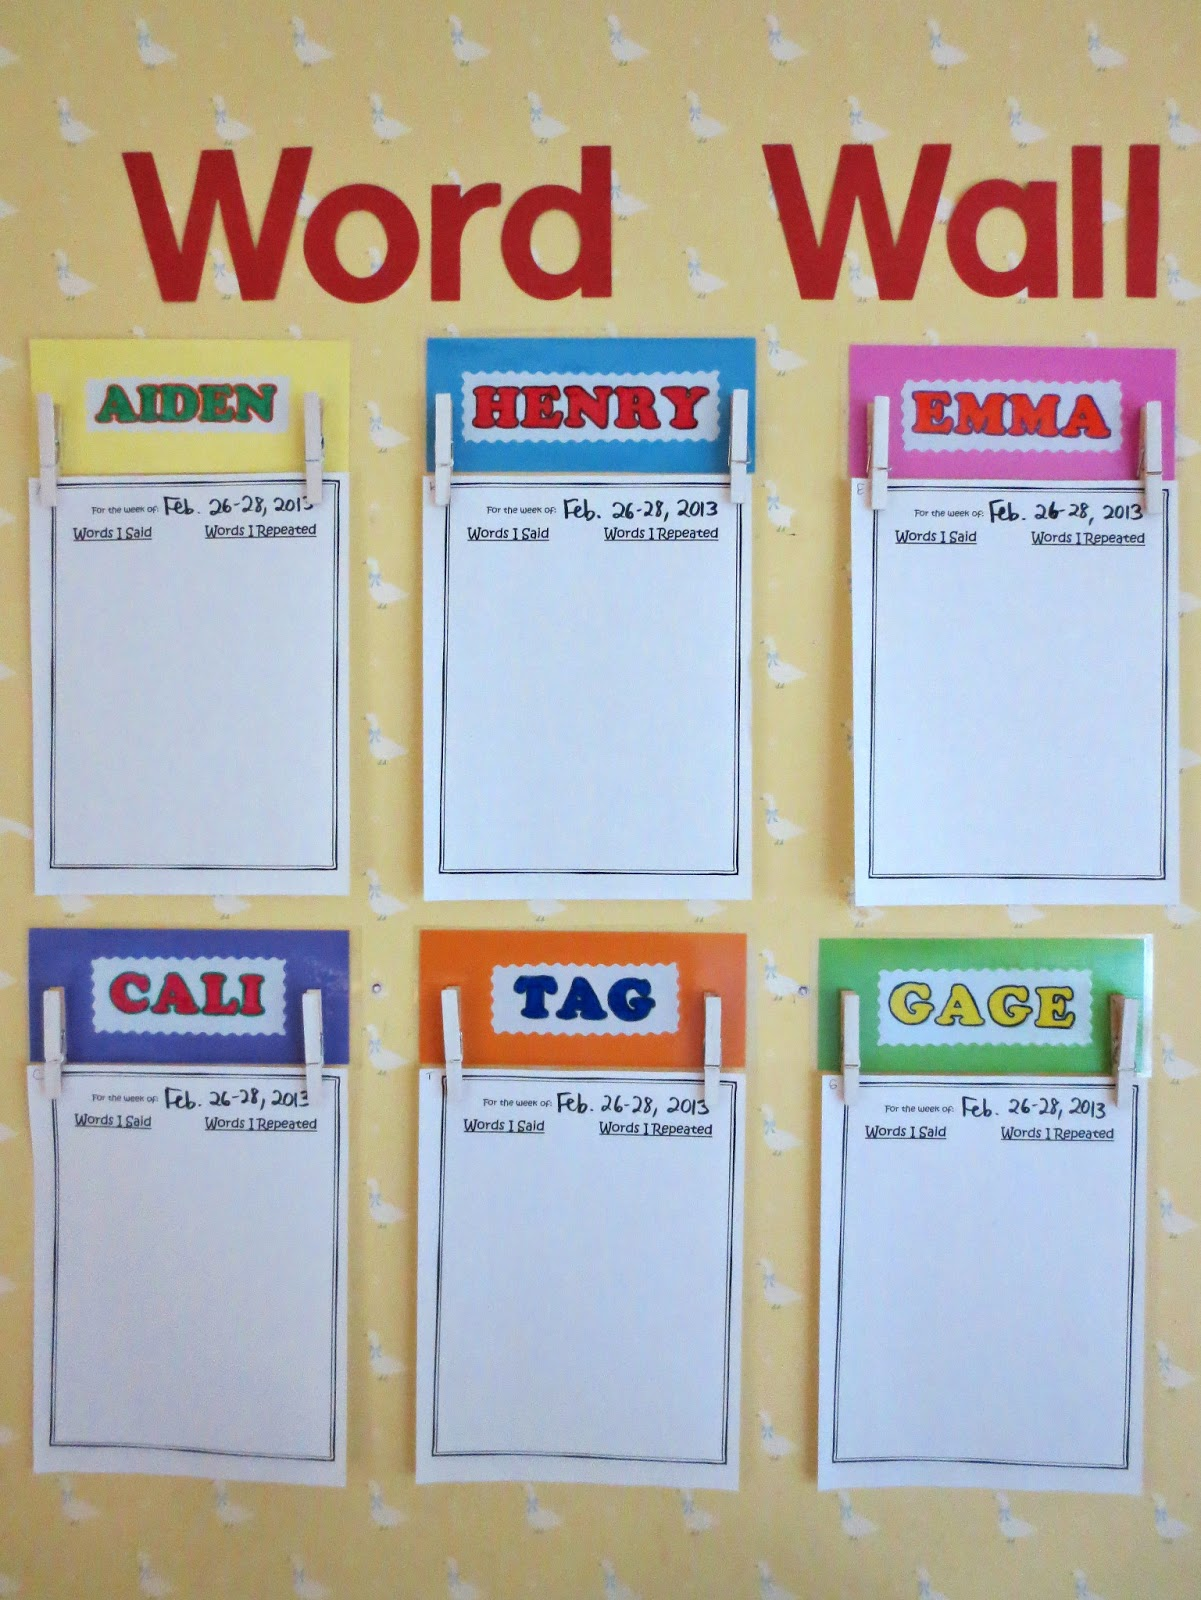 Word Wall Ideas For Preschool : Princesses pies preschool pizzazz toddler word wall